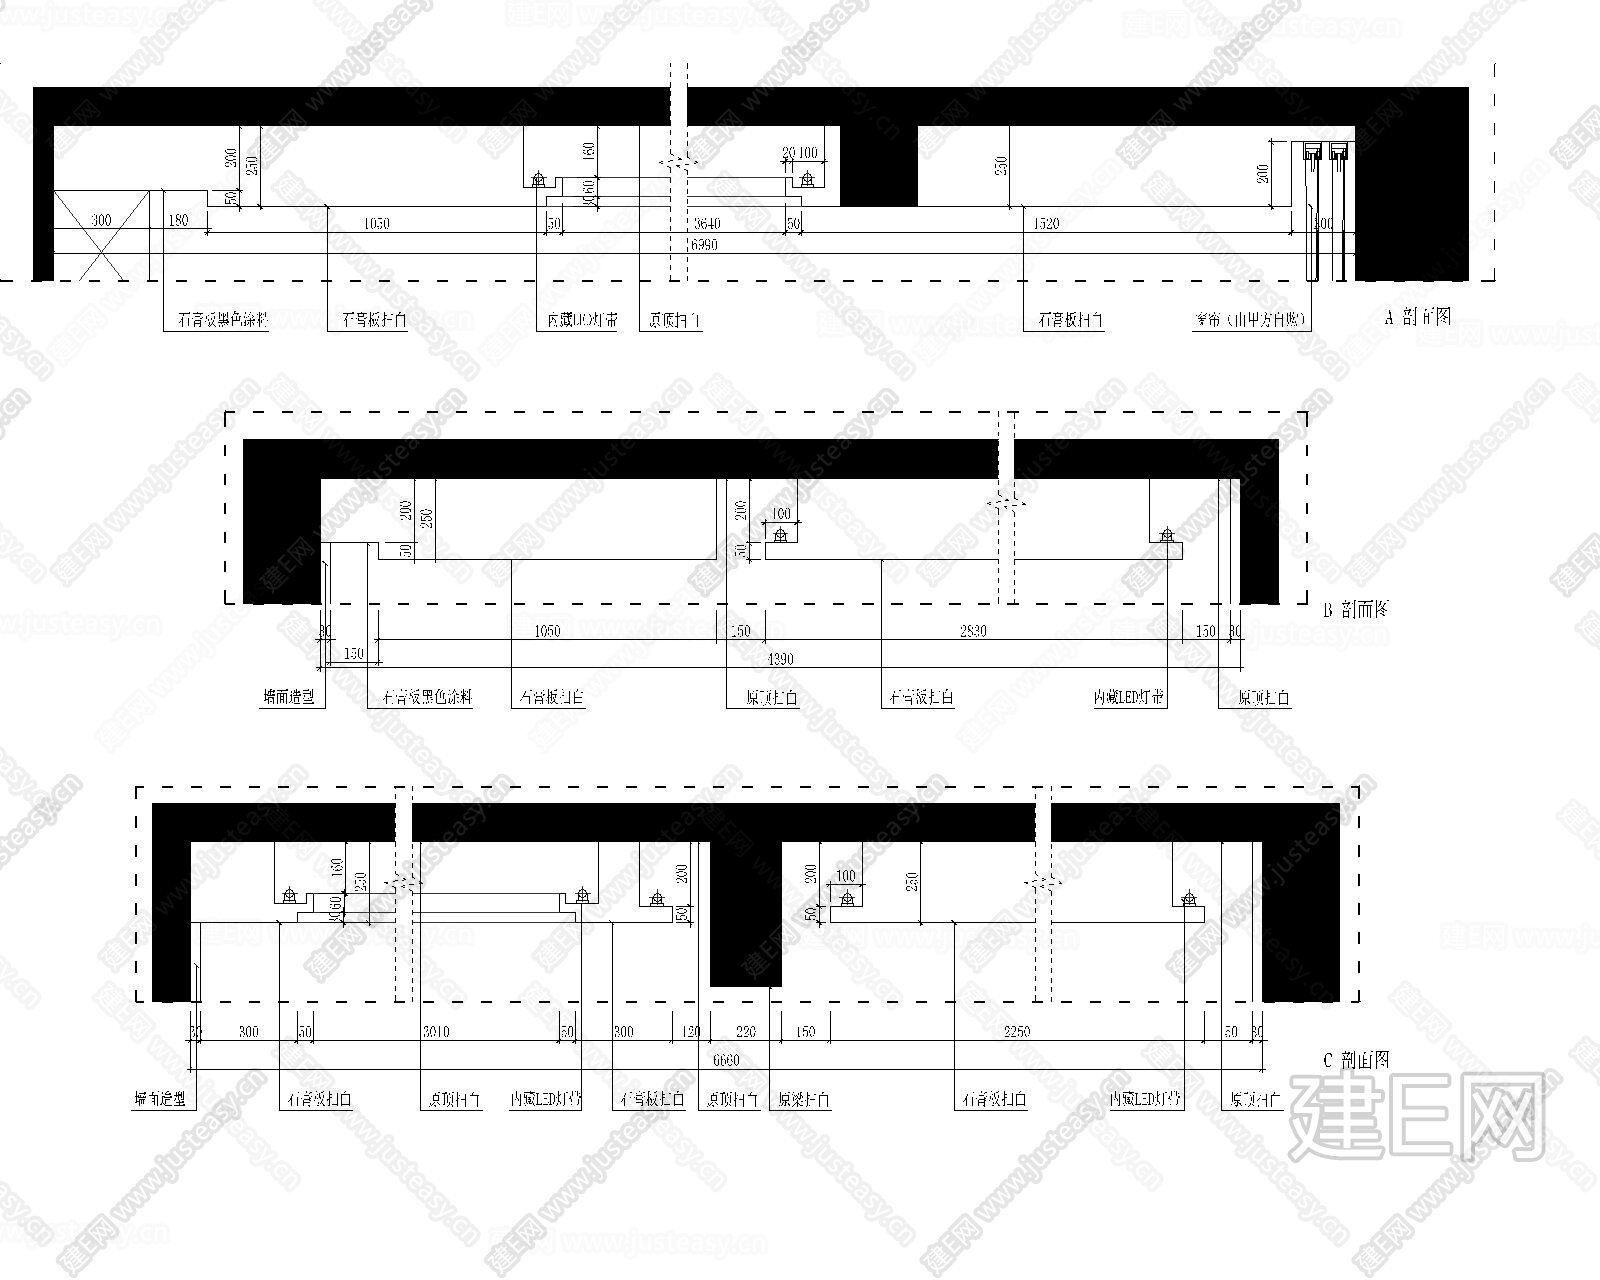 家装竣工图|CAD施工图